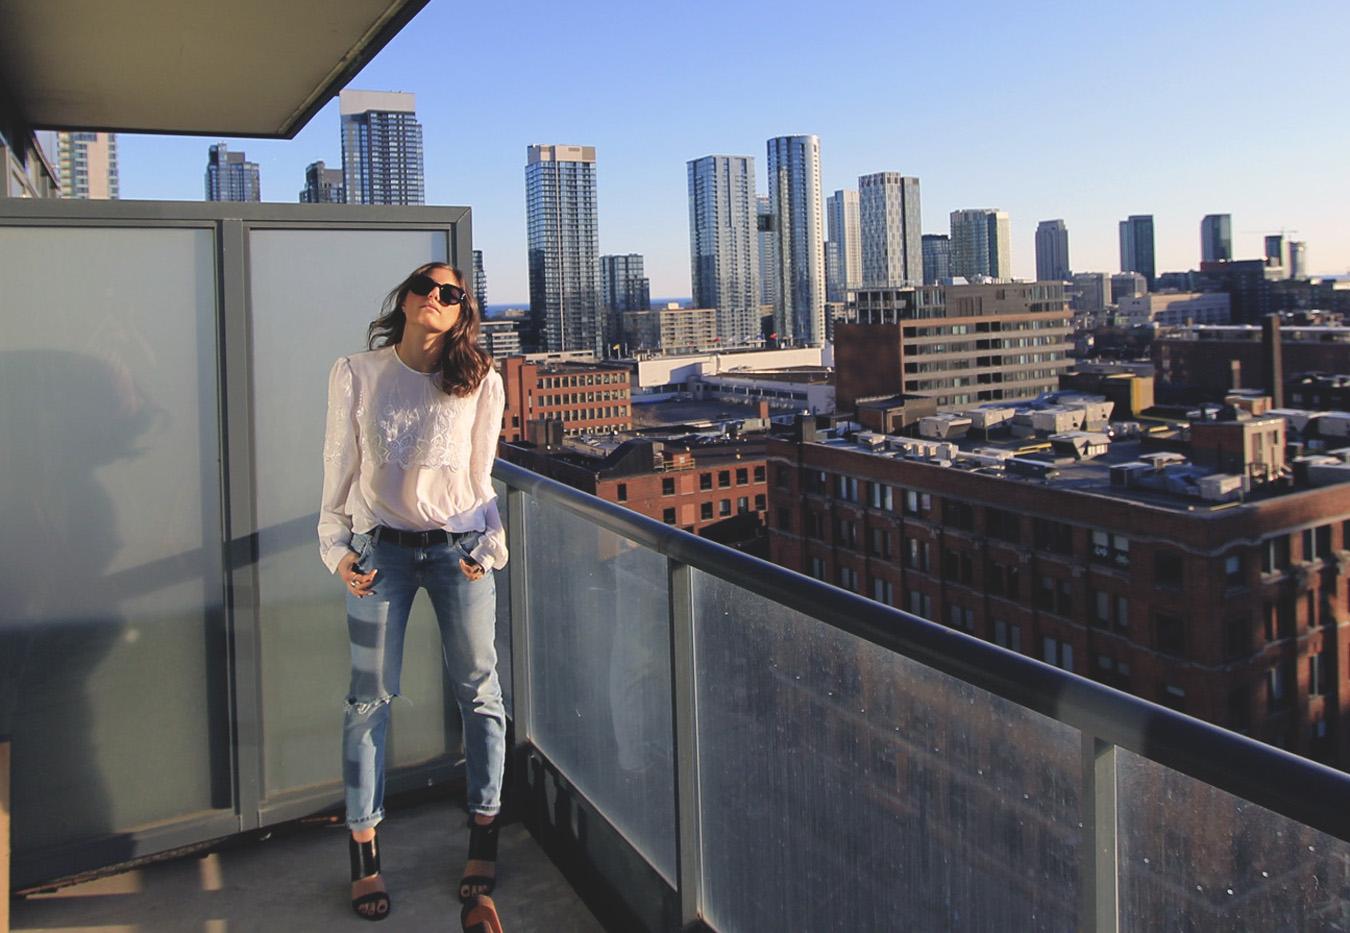 zara-vintage-forever-21-outfit-jeans-white-blouse.jpg